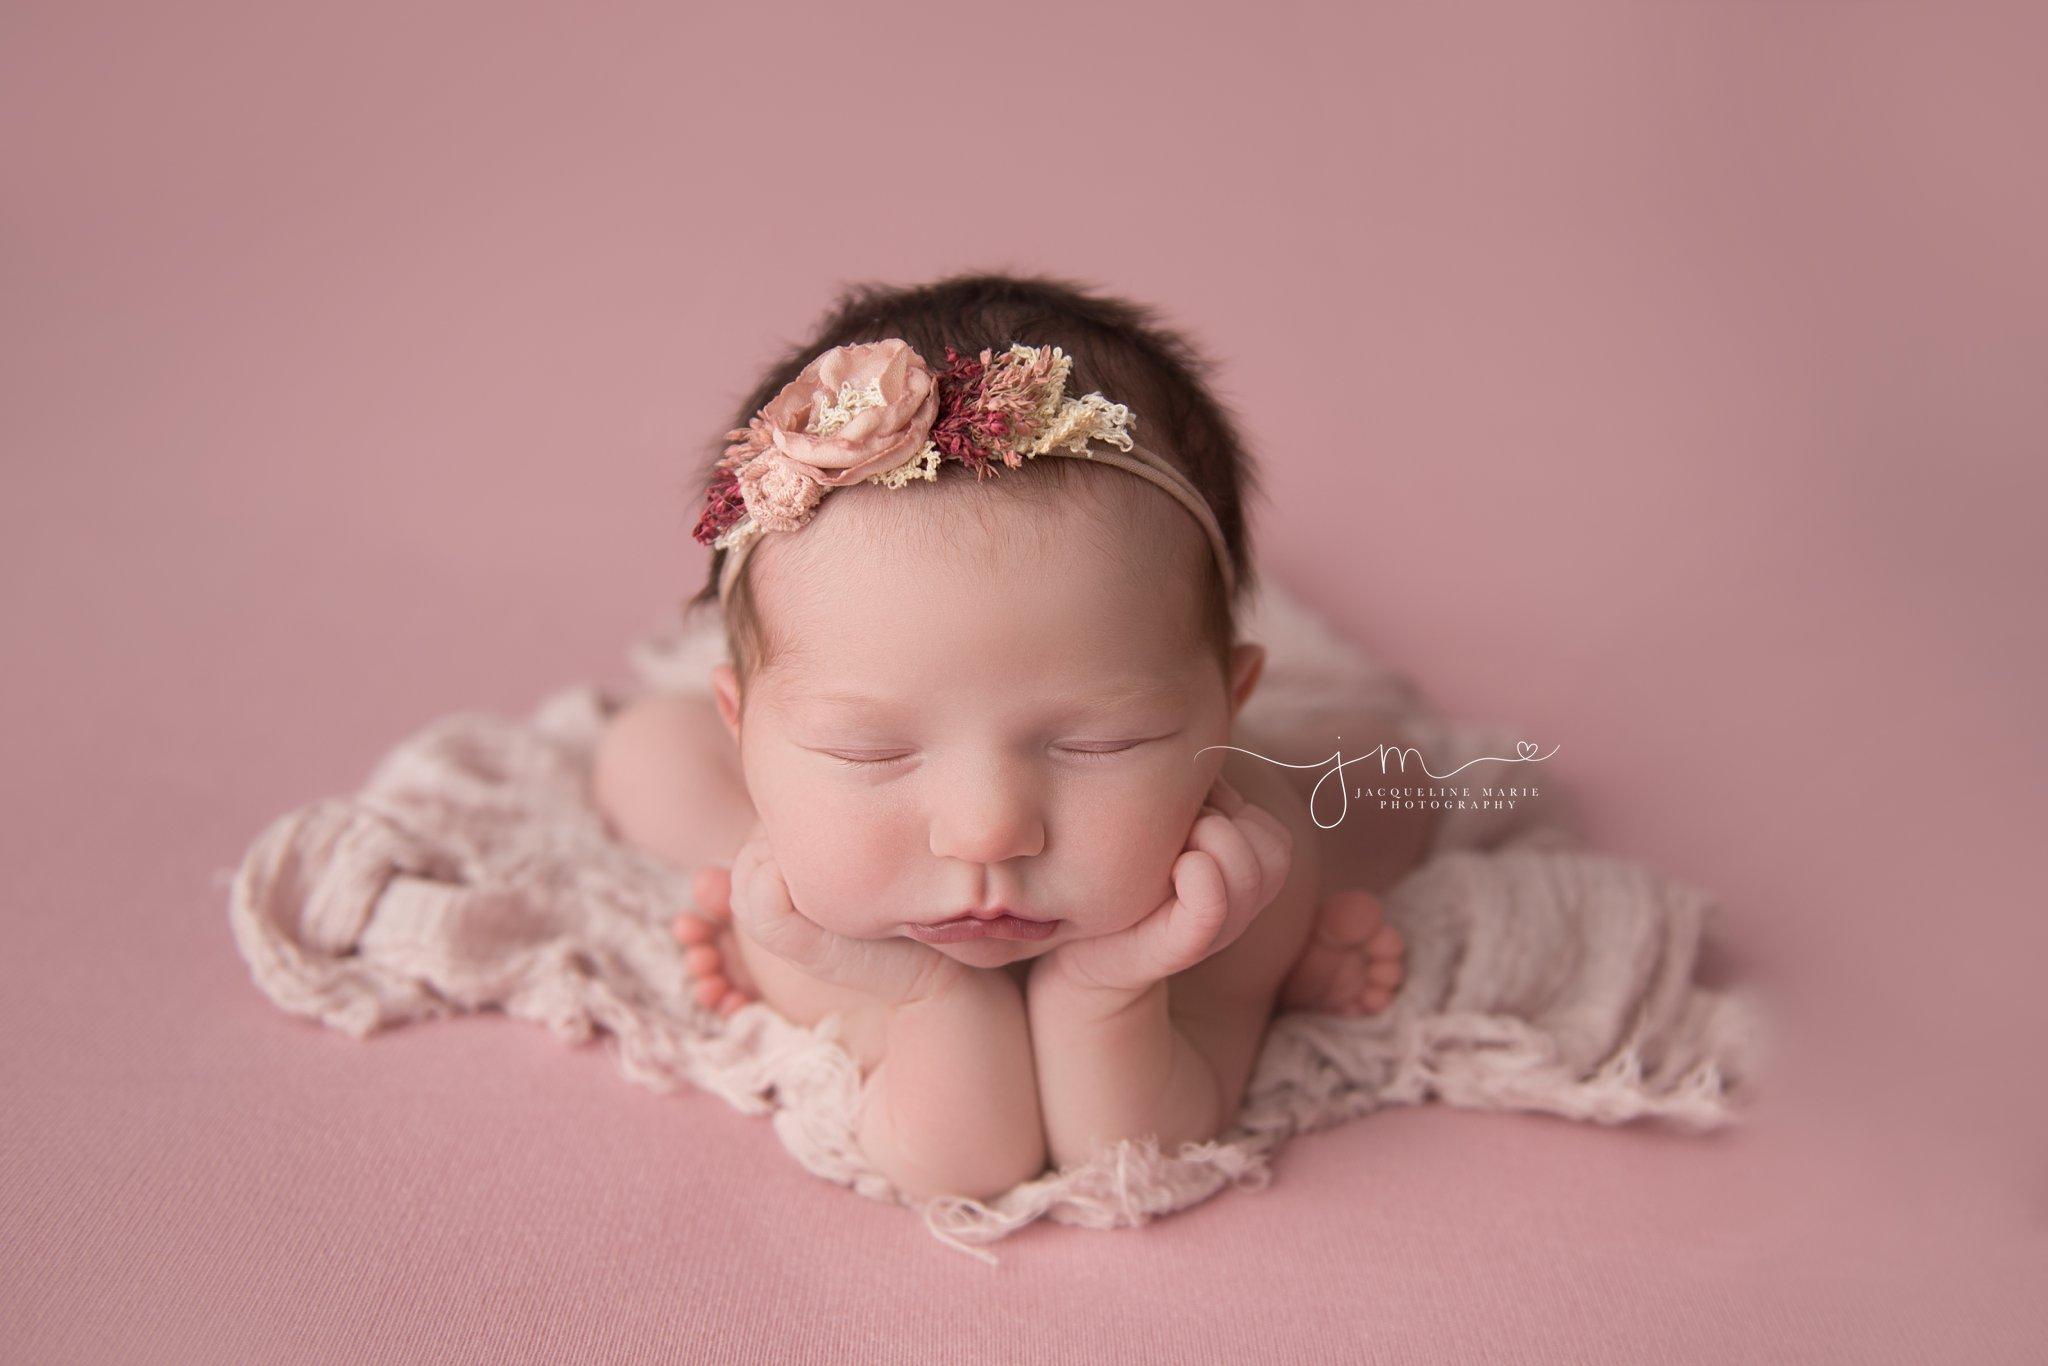 columbus ohio newborn baby girl wears pink floral headband for newborn pictures